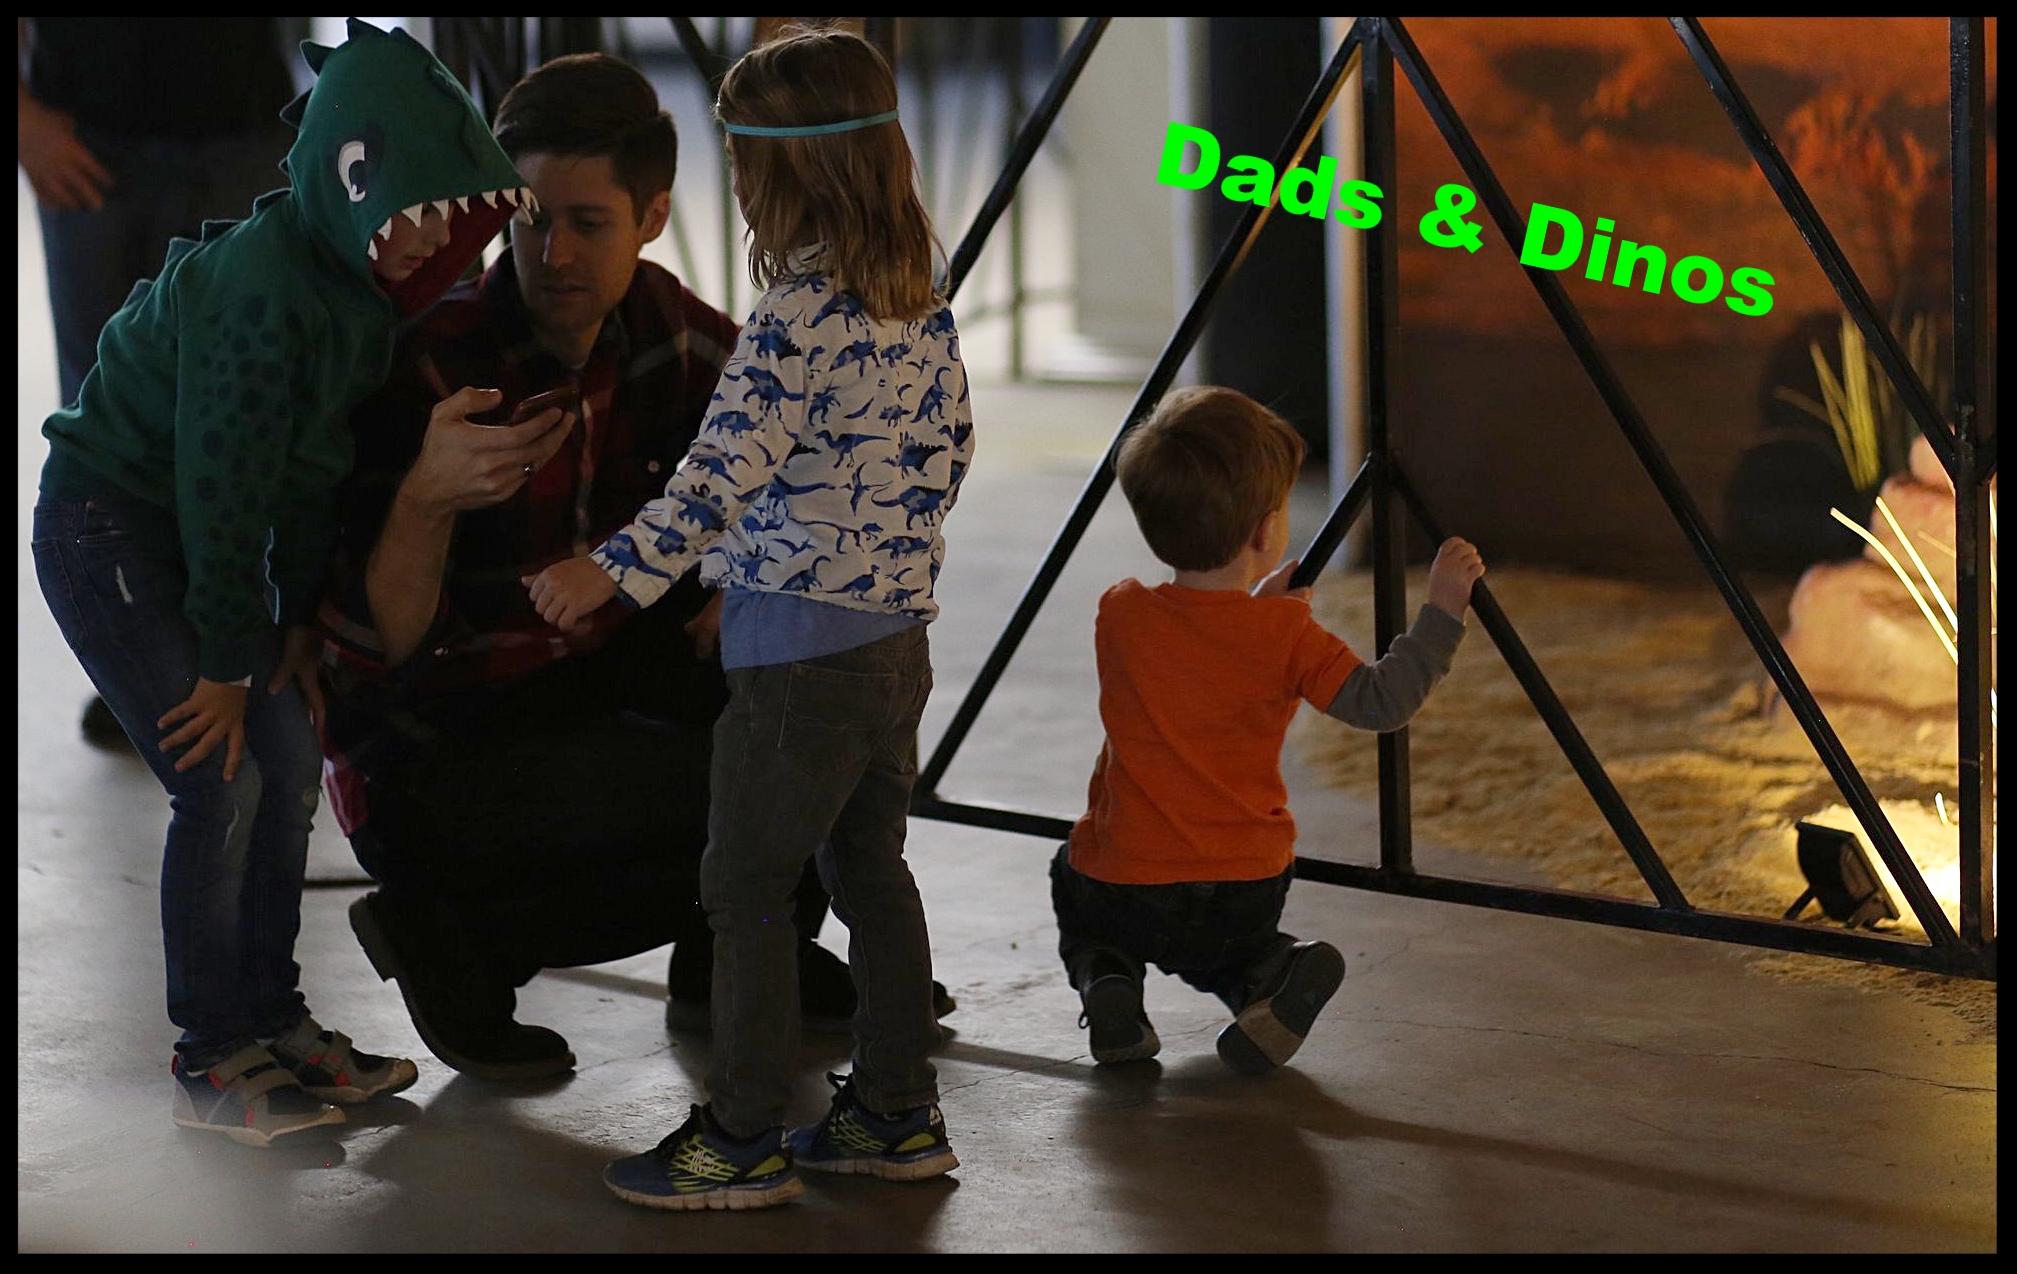 Dads&dinos.jpg